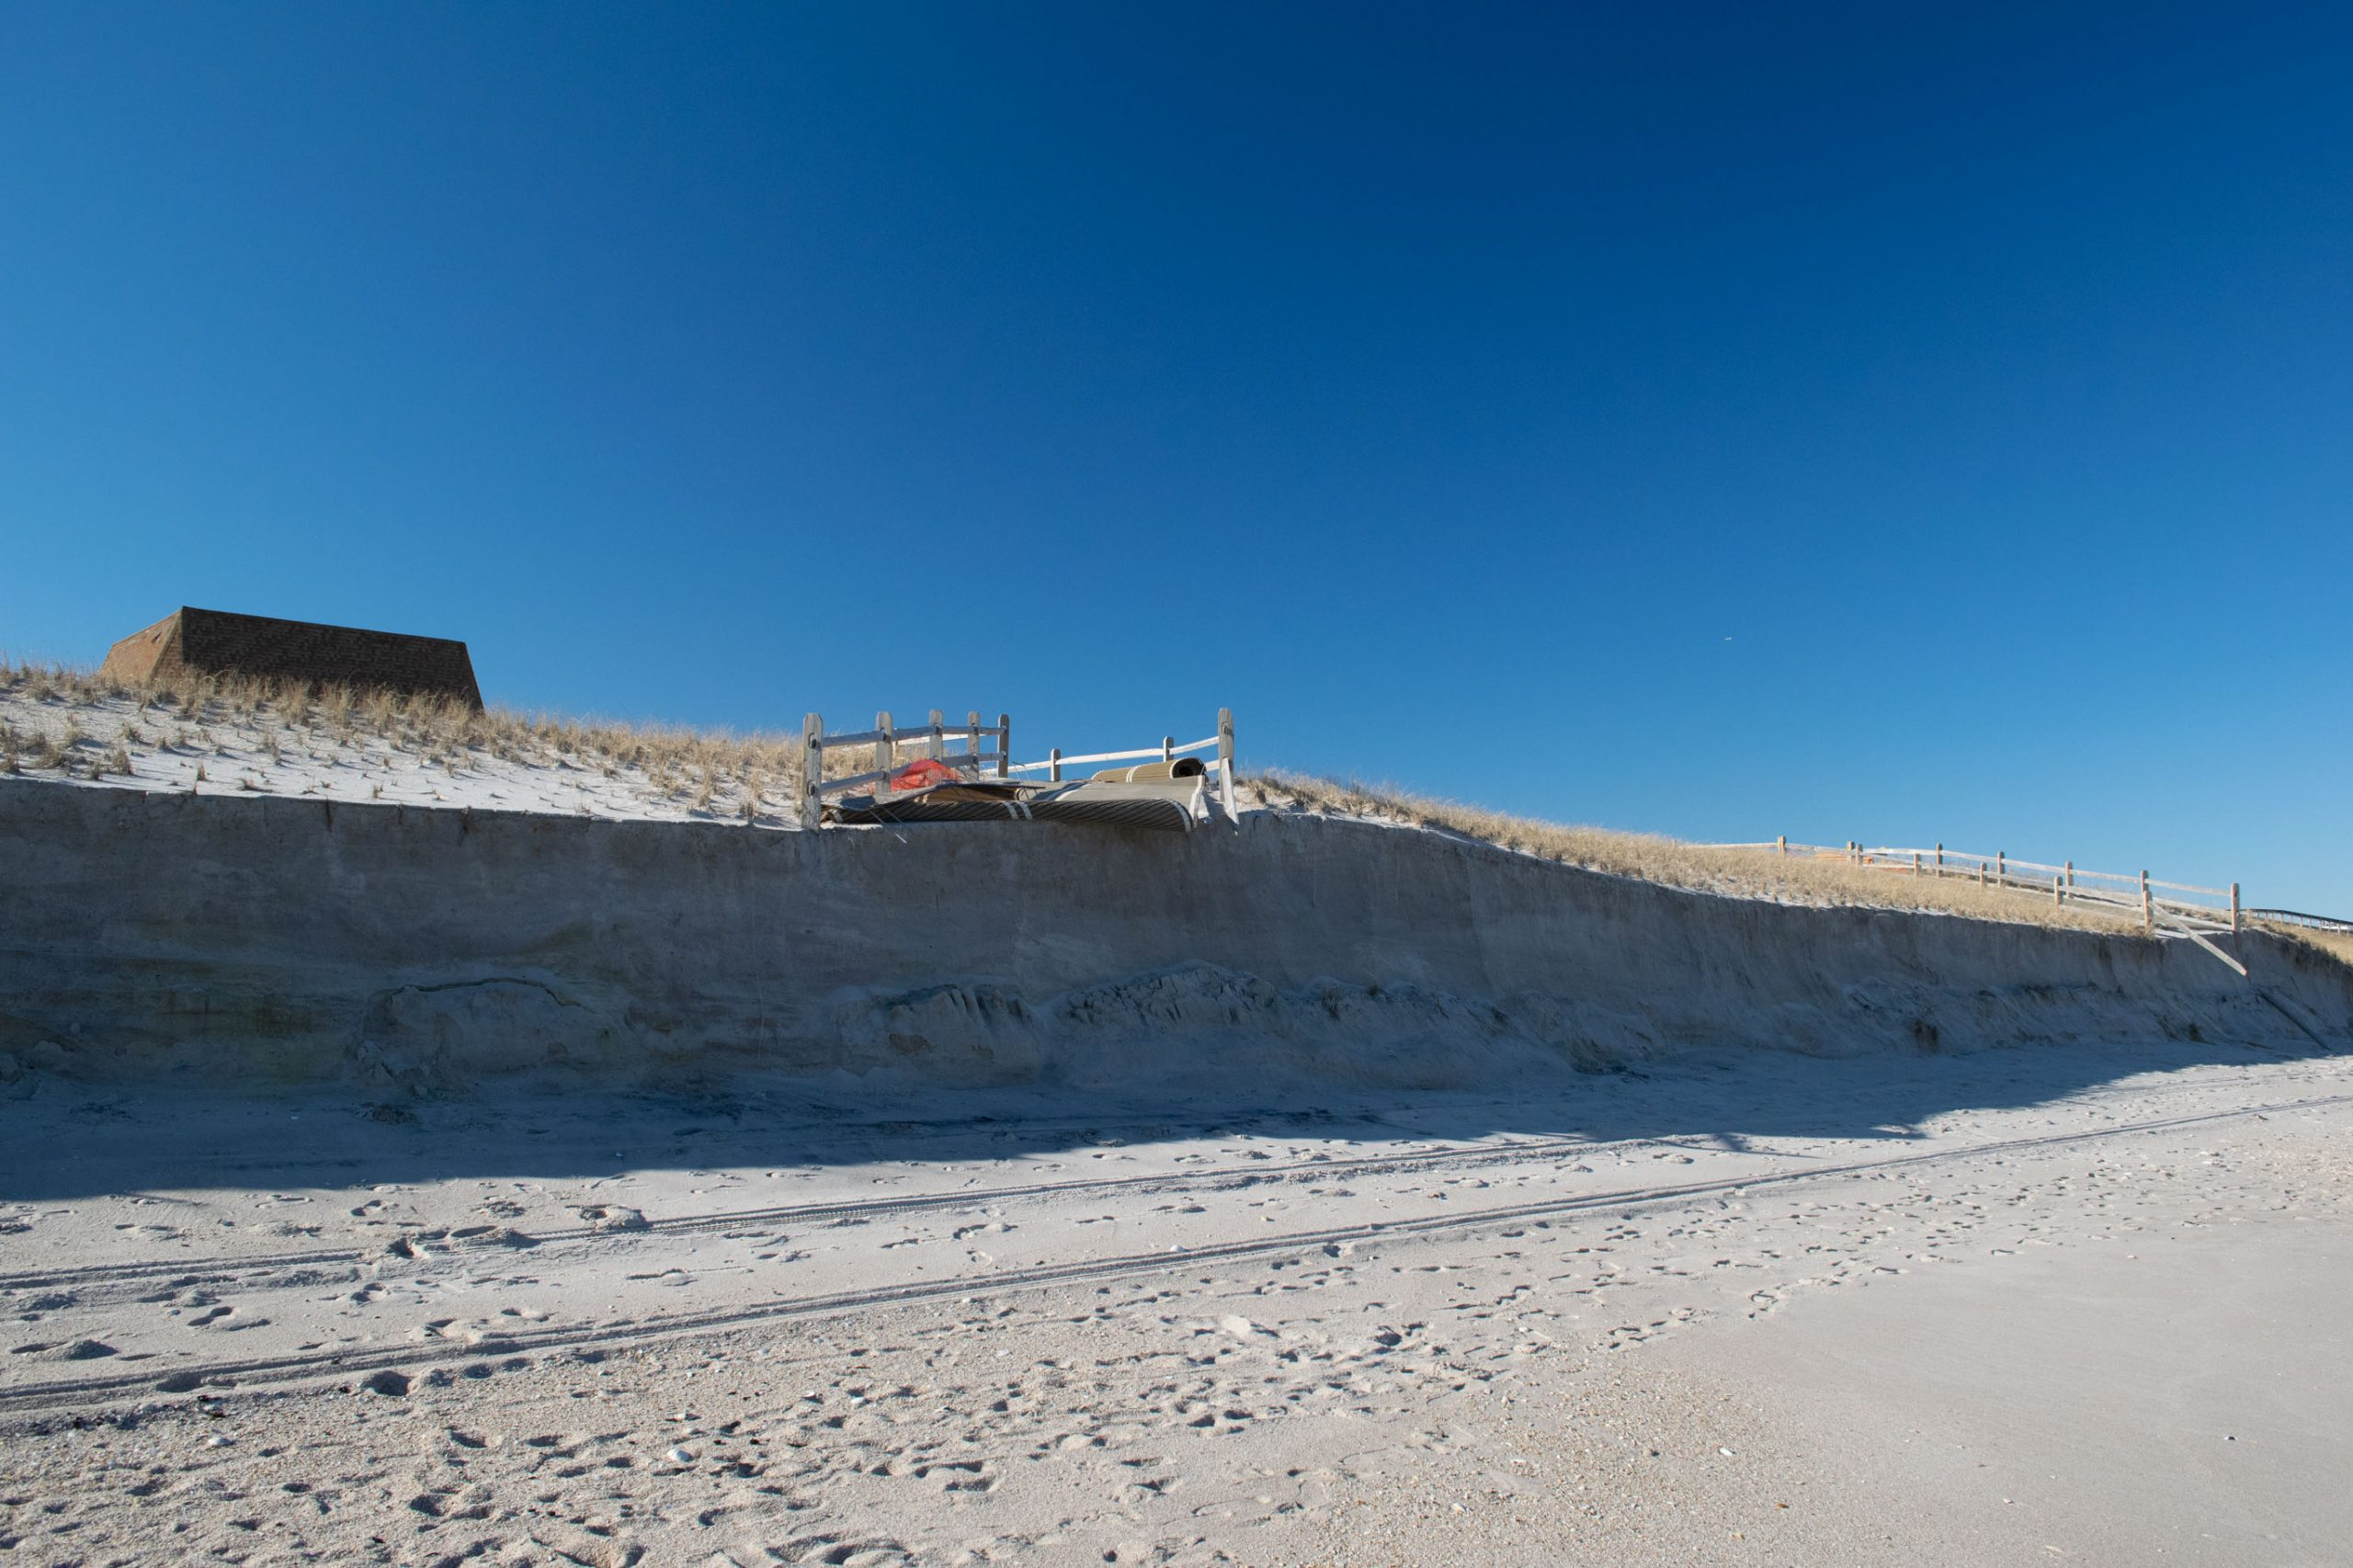 Dune damage and beach erosion following the Feb. 1-3, 2021 nor'easter. (Photo: Daniel Nee)